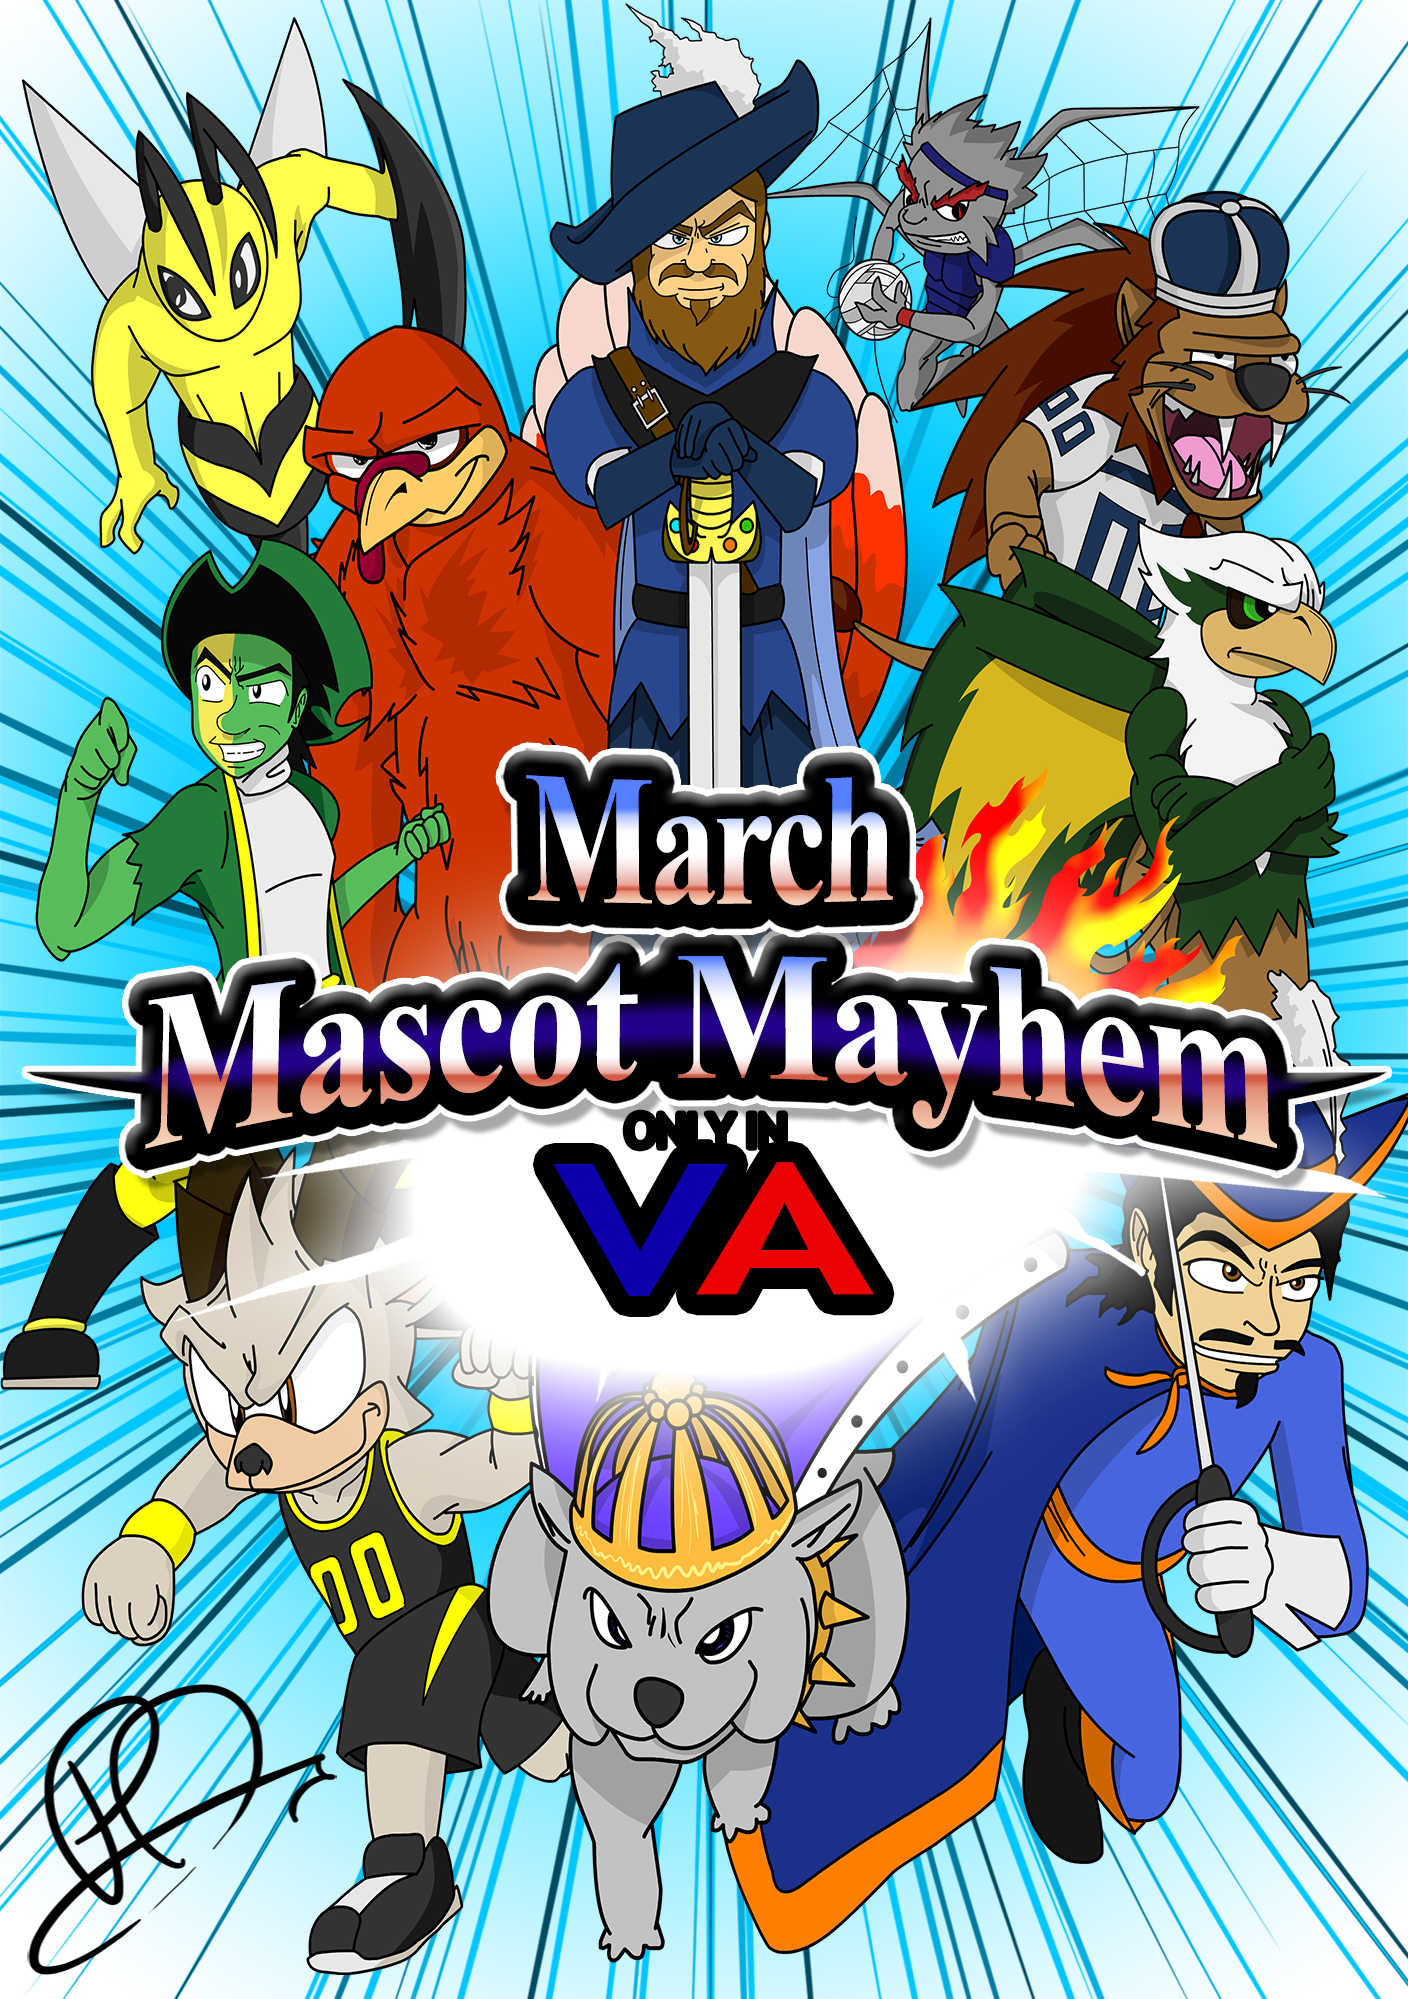 March Mascot Mayhem!